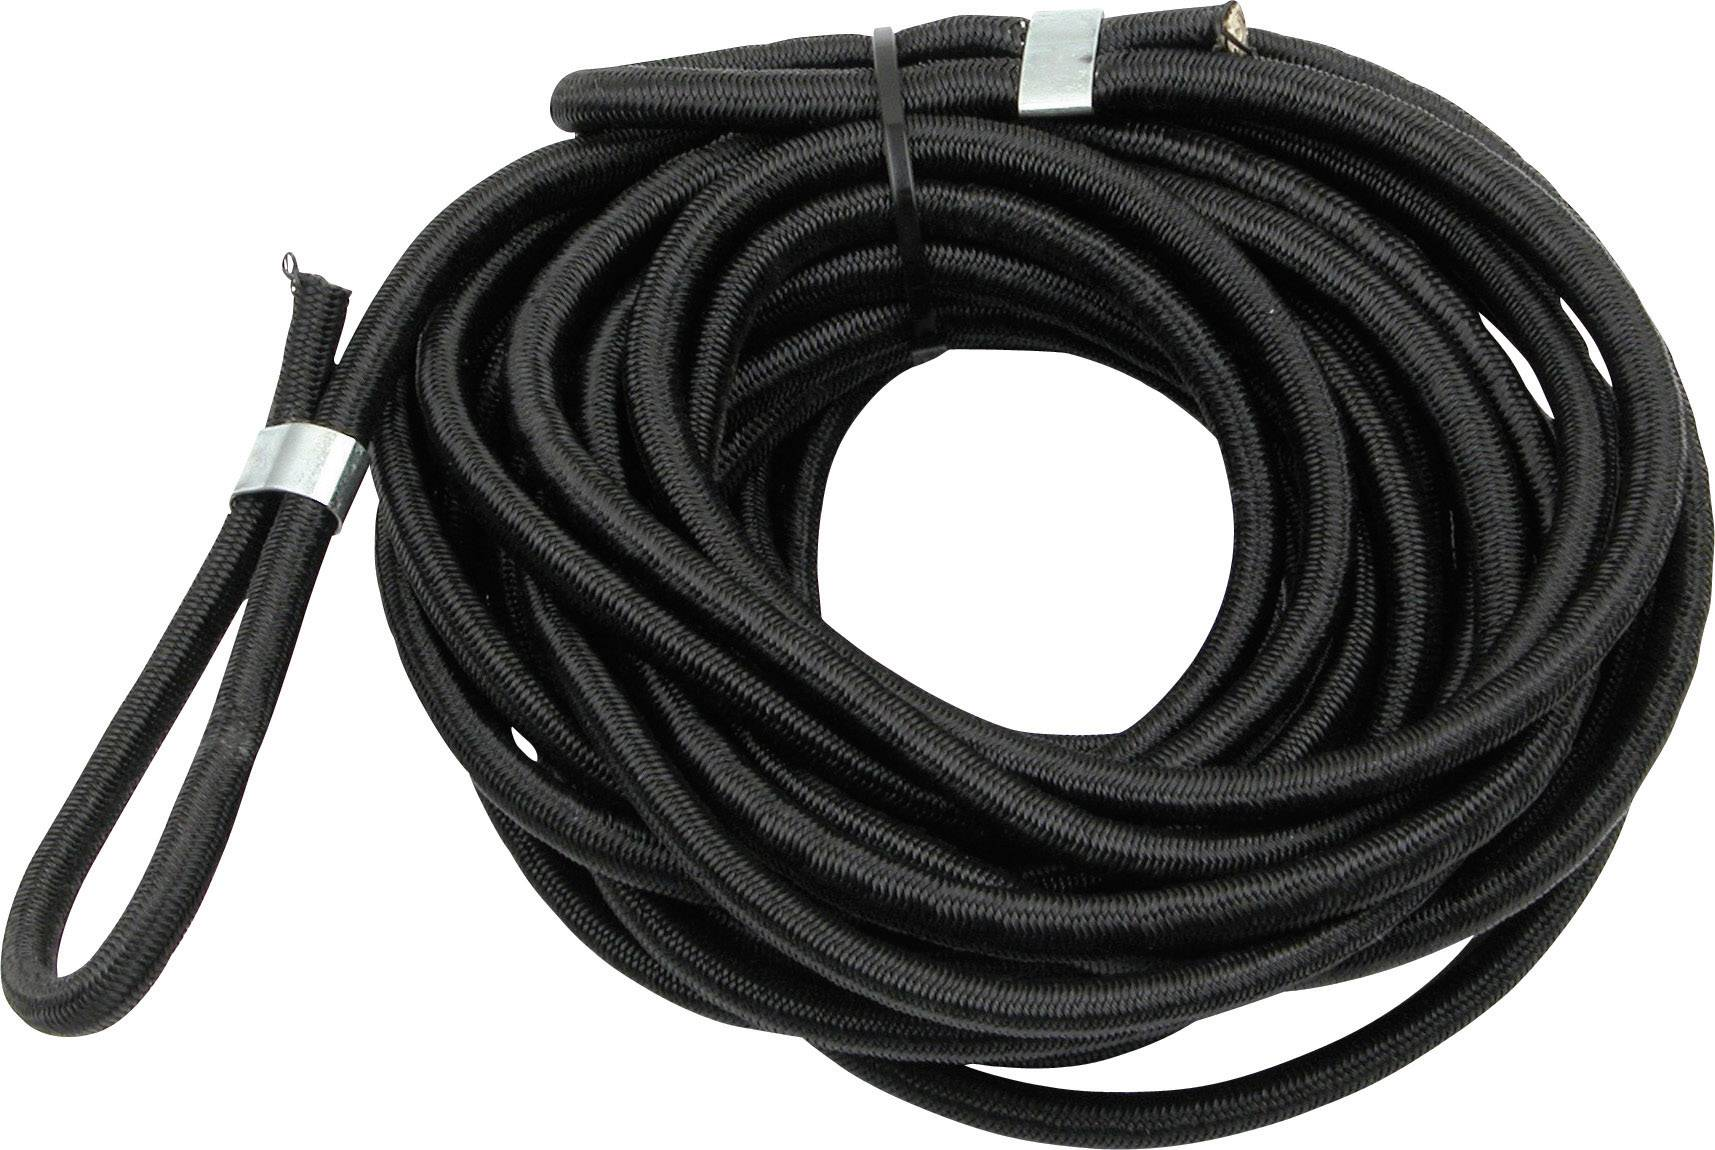 Elastický kabel, 7.5 mm x 7 m